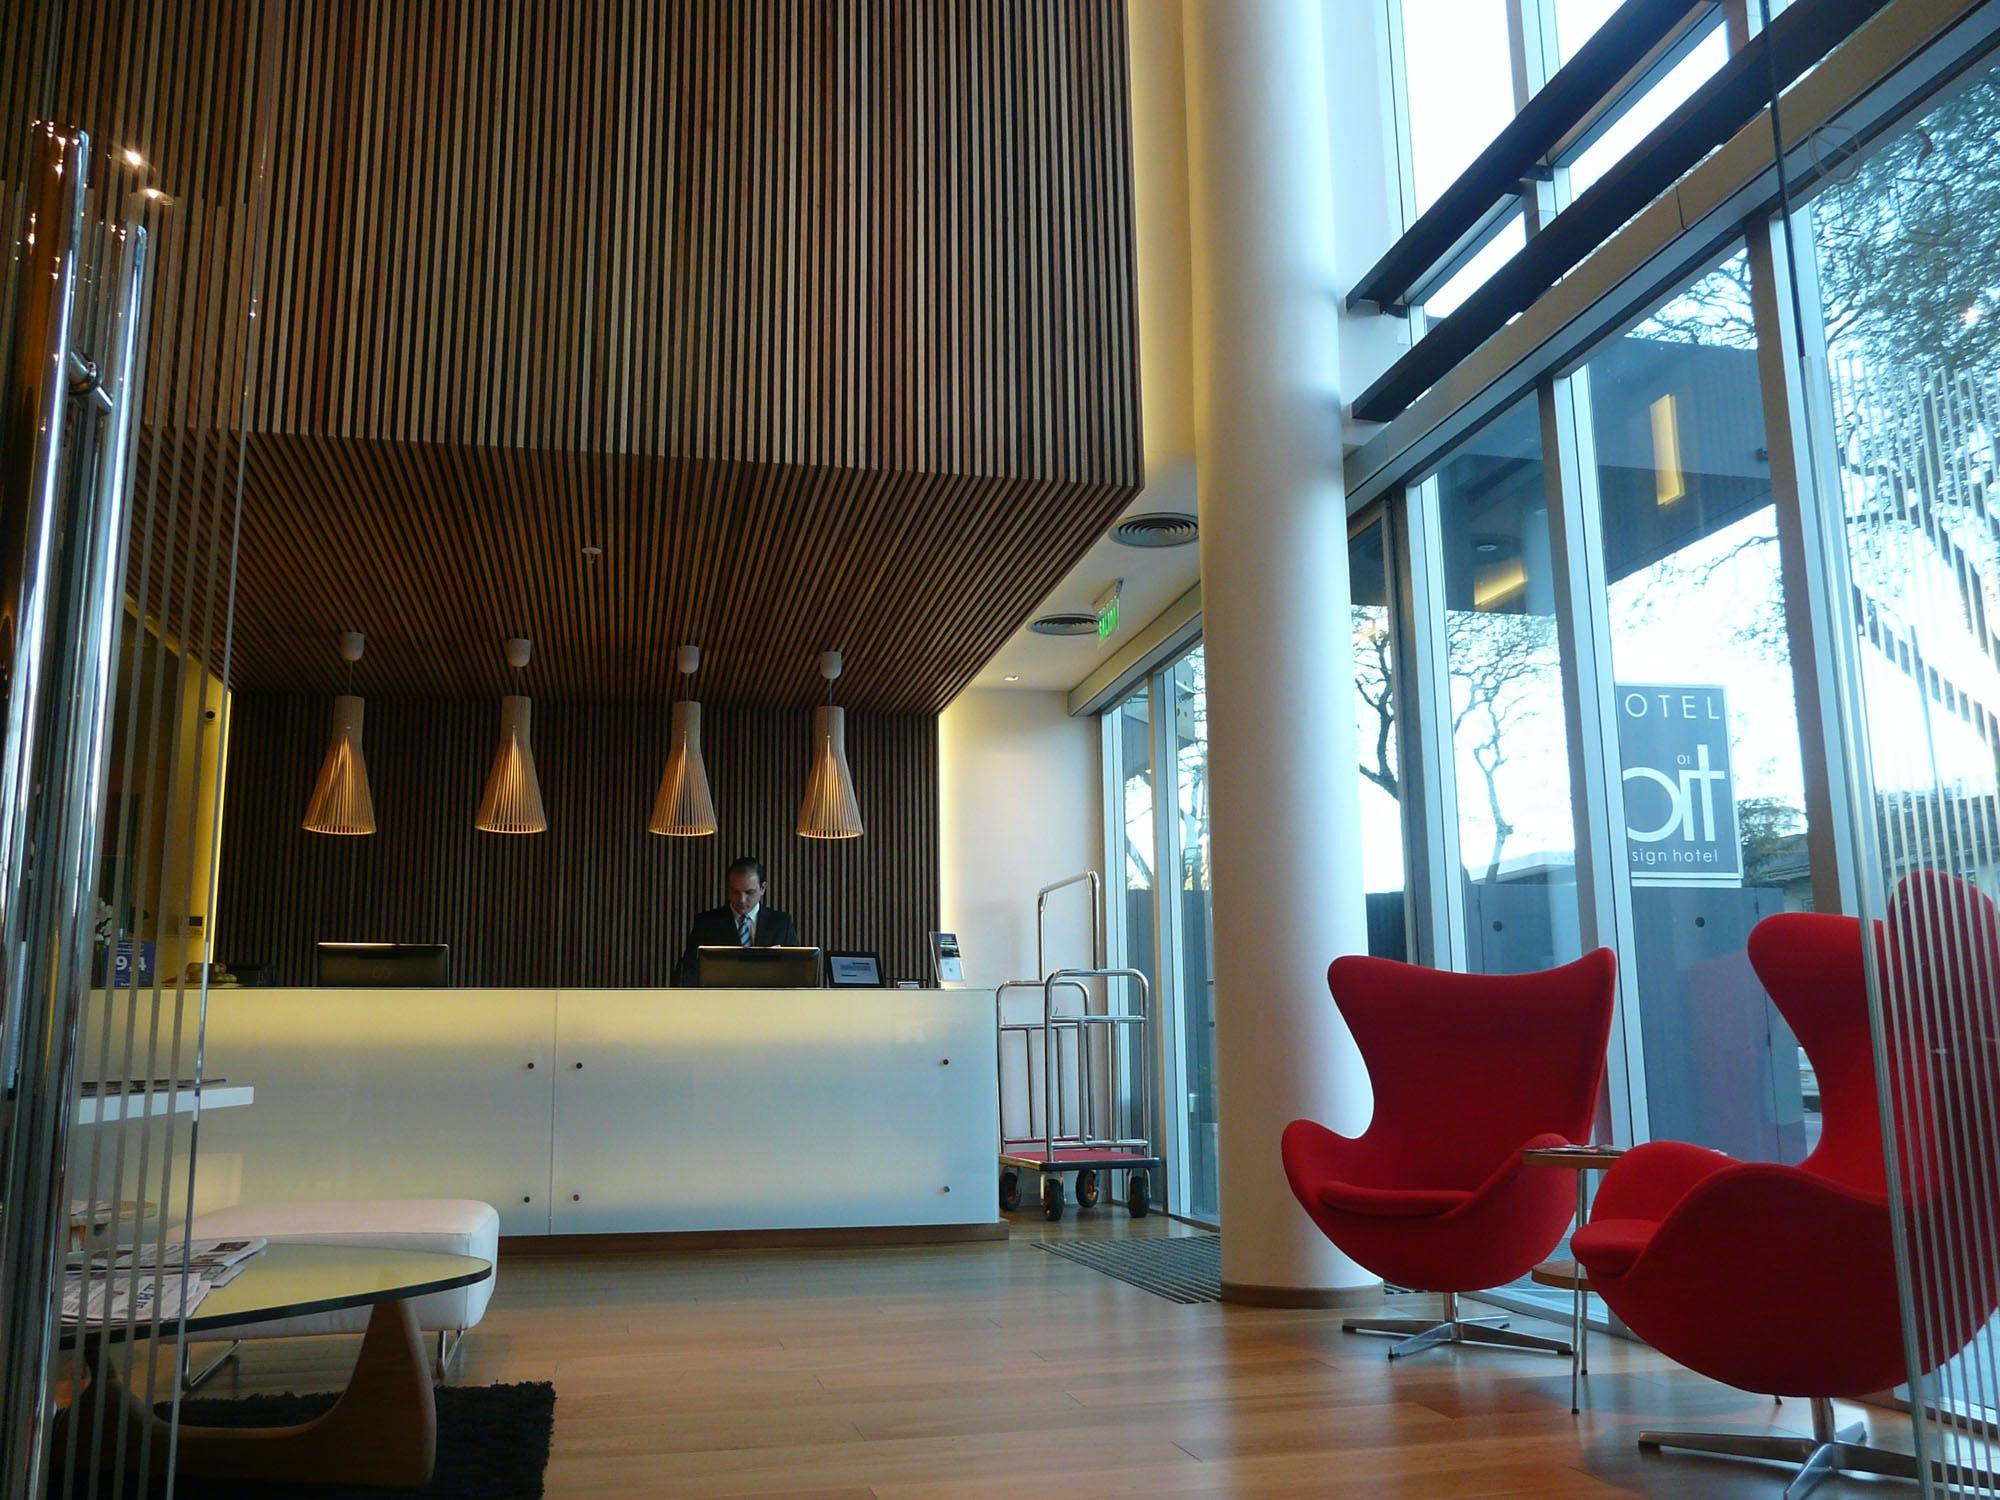 Bit Design Hotel Interior Design Marcelo Aguiar Pardo Archinect